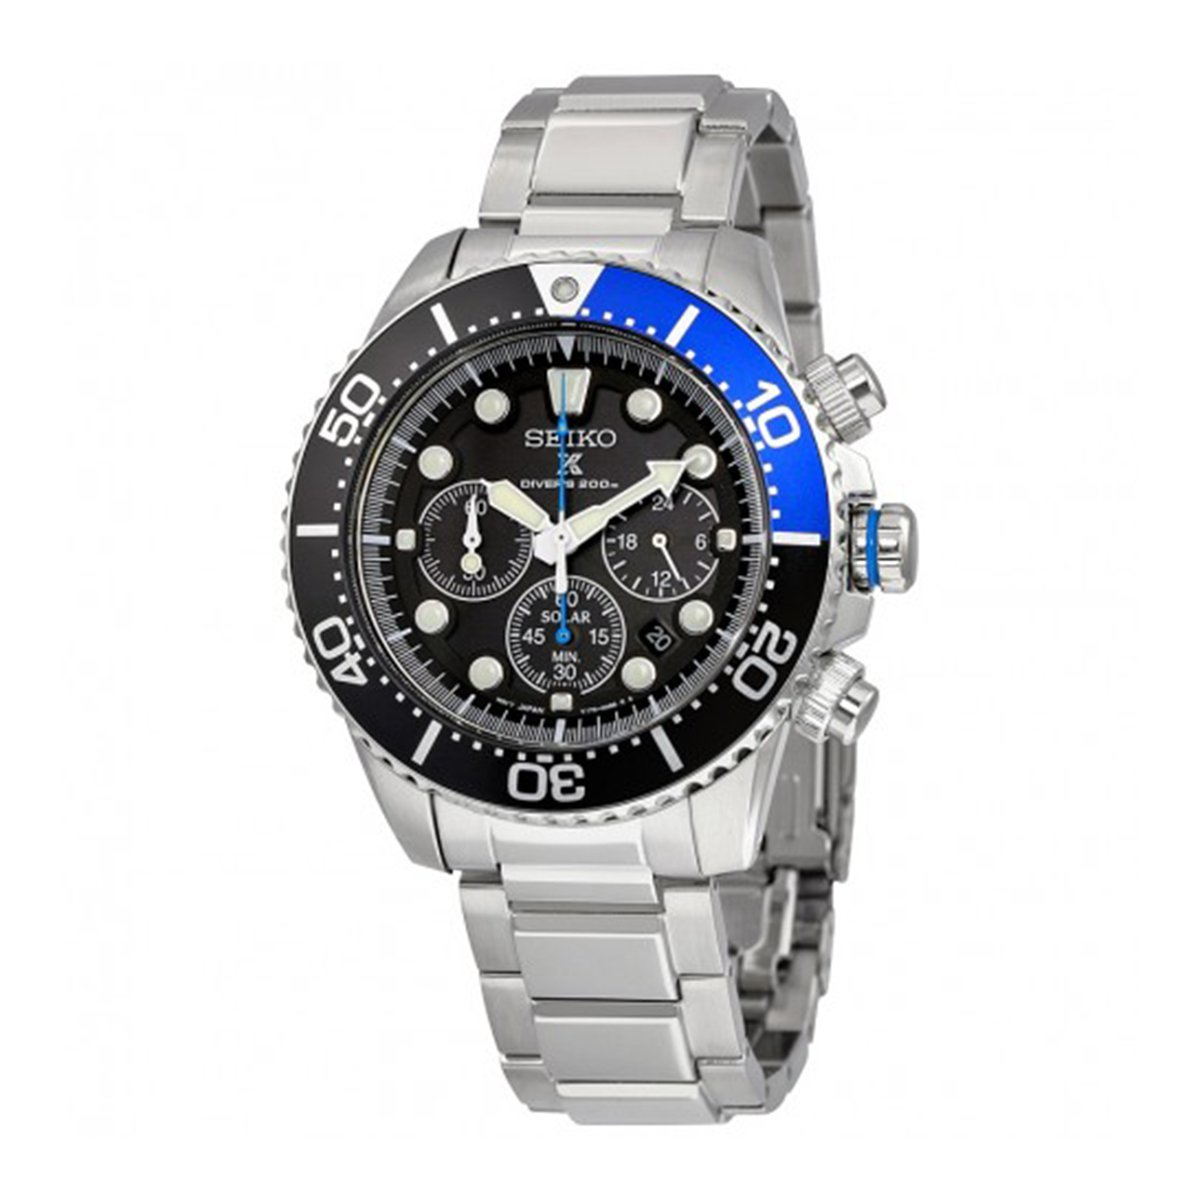 Seiko Men s Silvertone Solar Chronograph Diver Watch